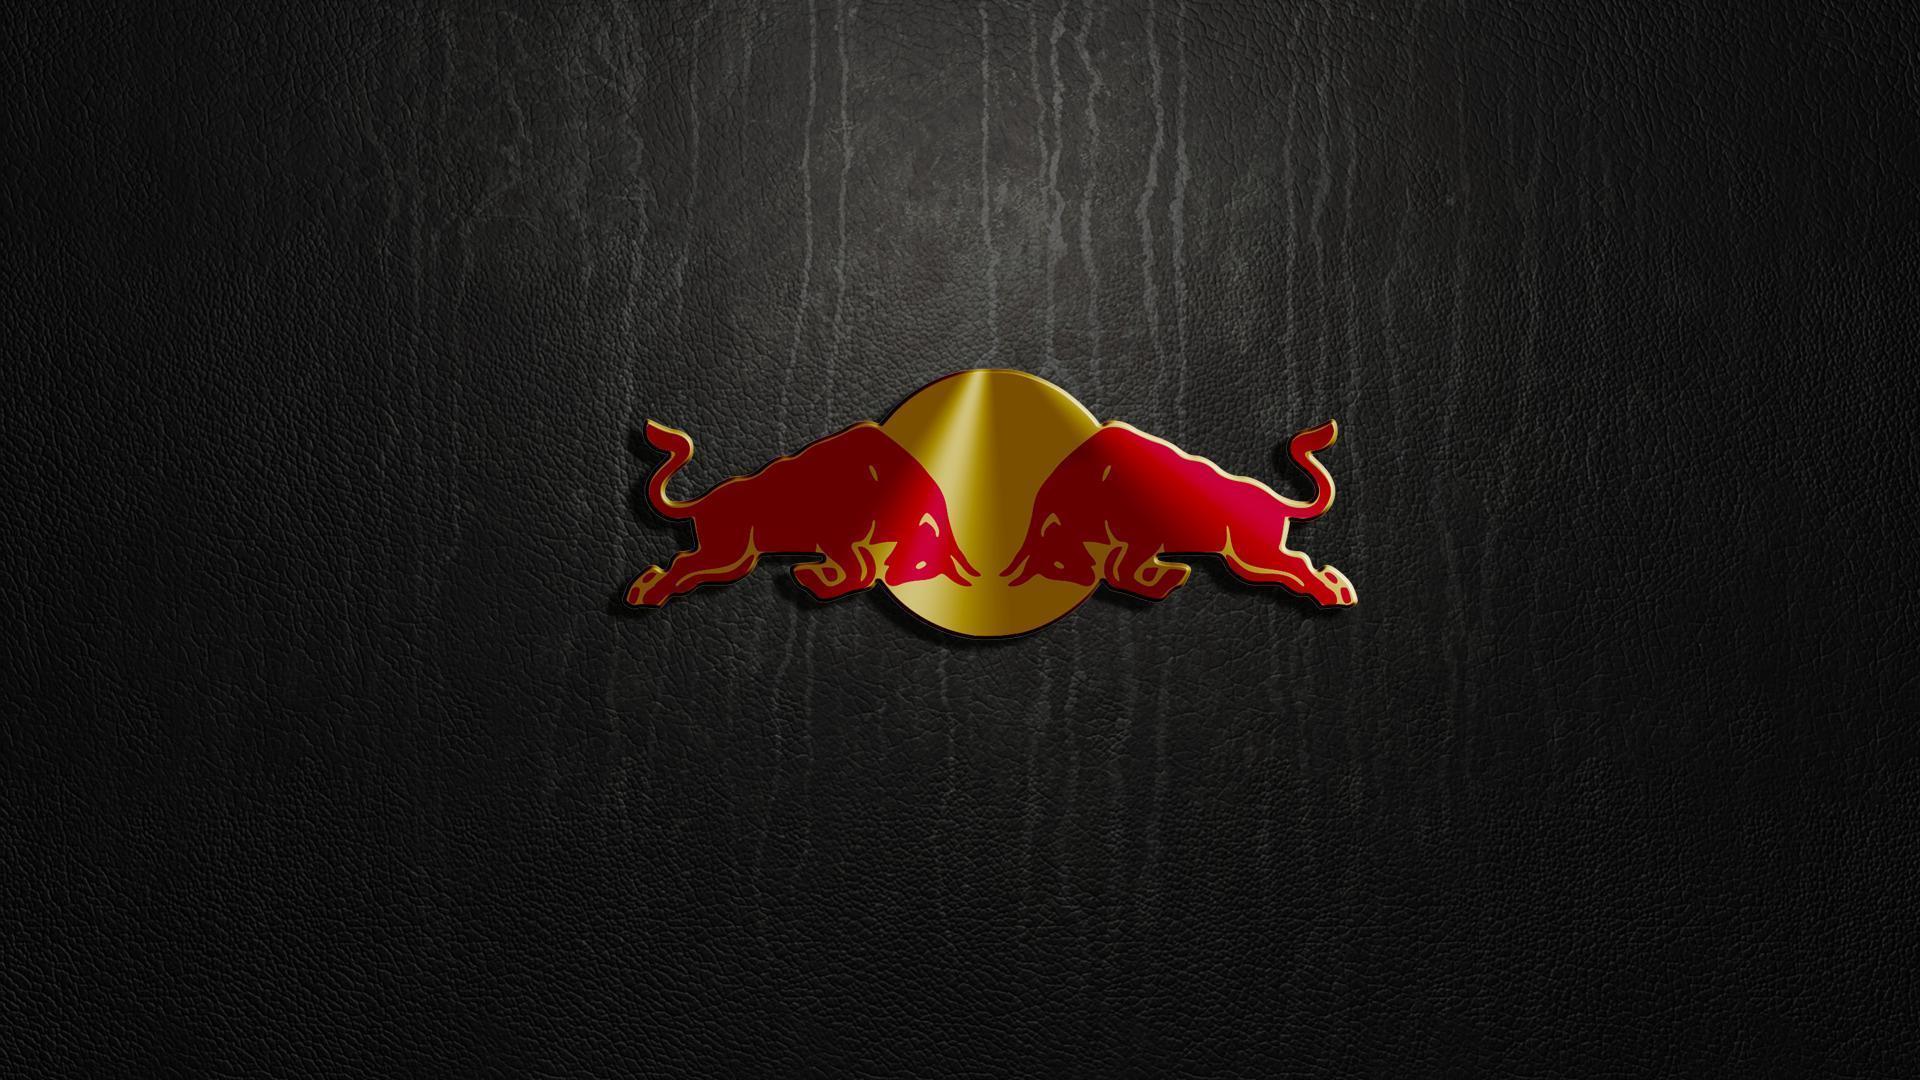 red bull logo wallpapers wallpaper cave